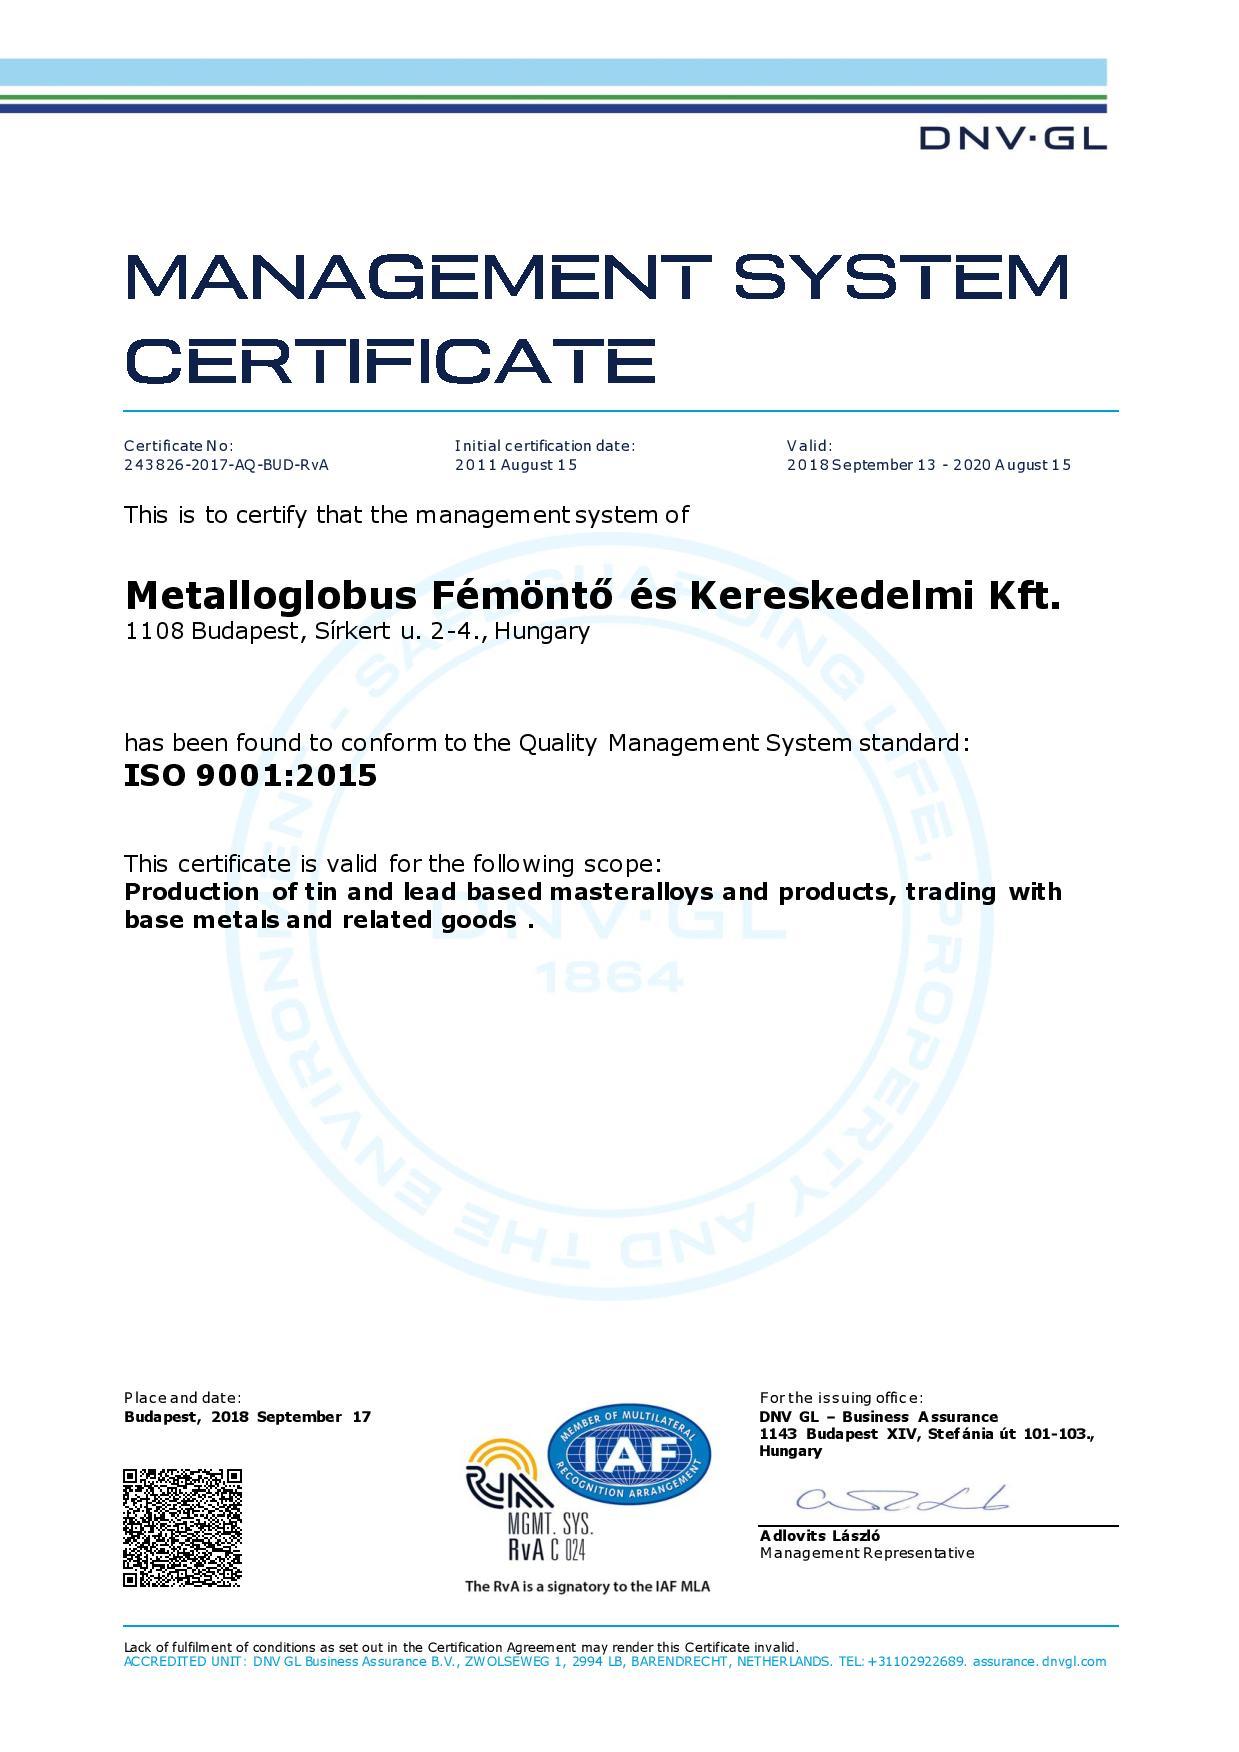 ISO Certificate Metalloglobus Femonto